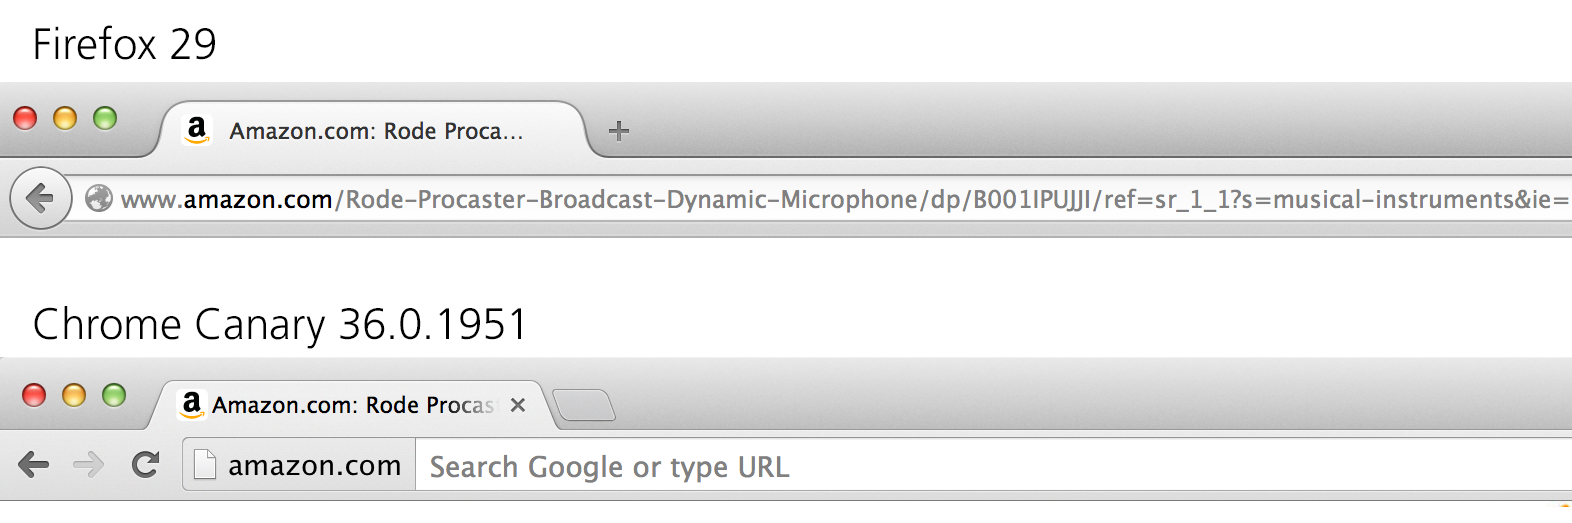 Blogof Alexey Bass 2014 Cellcom Laptop Syllabus Google Chrome Burying The Url